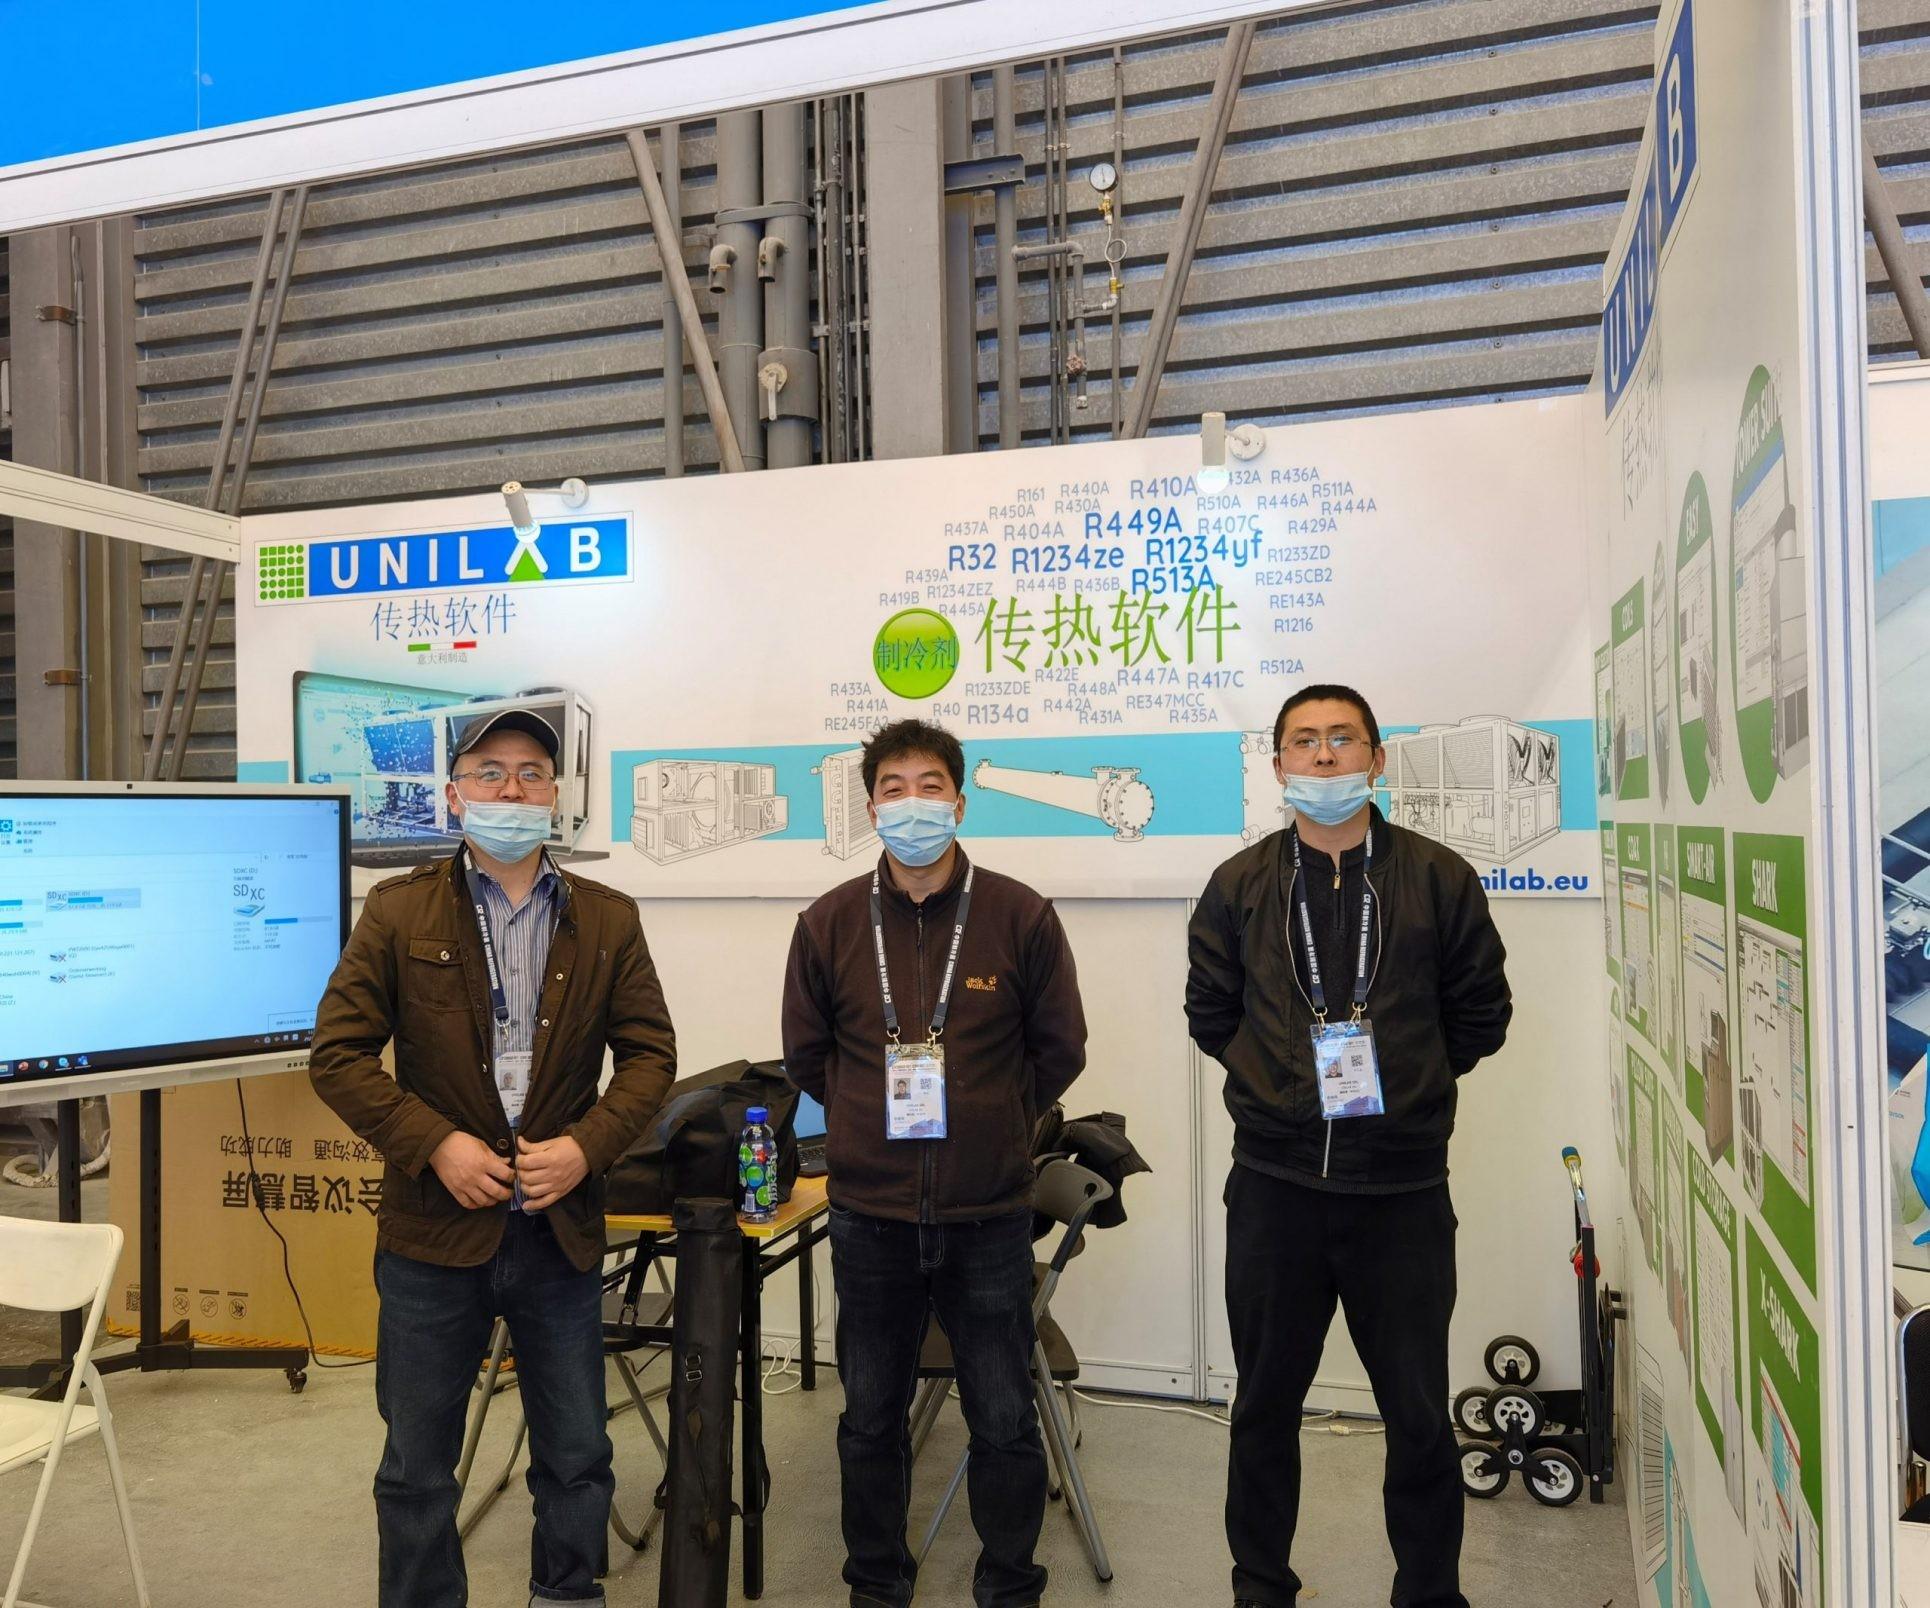 unilab_heat_transfer_software_blog_china_refrigeration_2021_shanghai